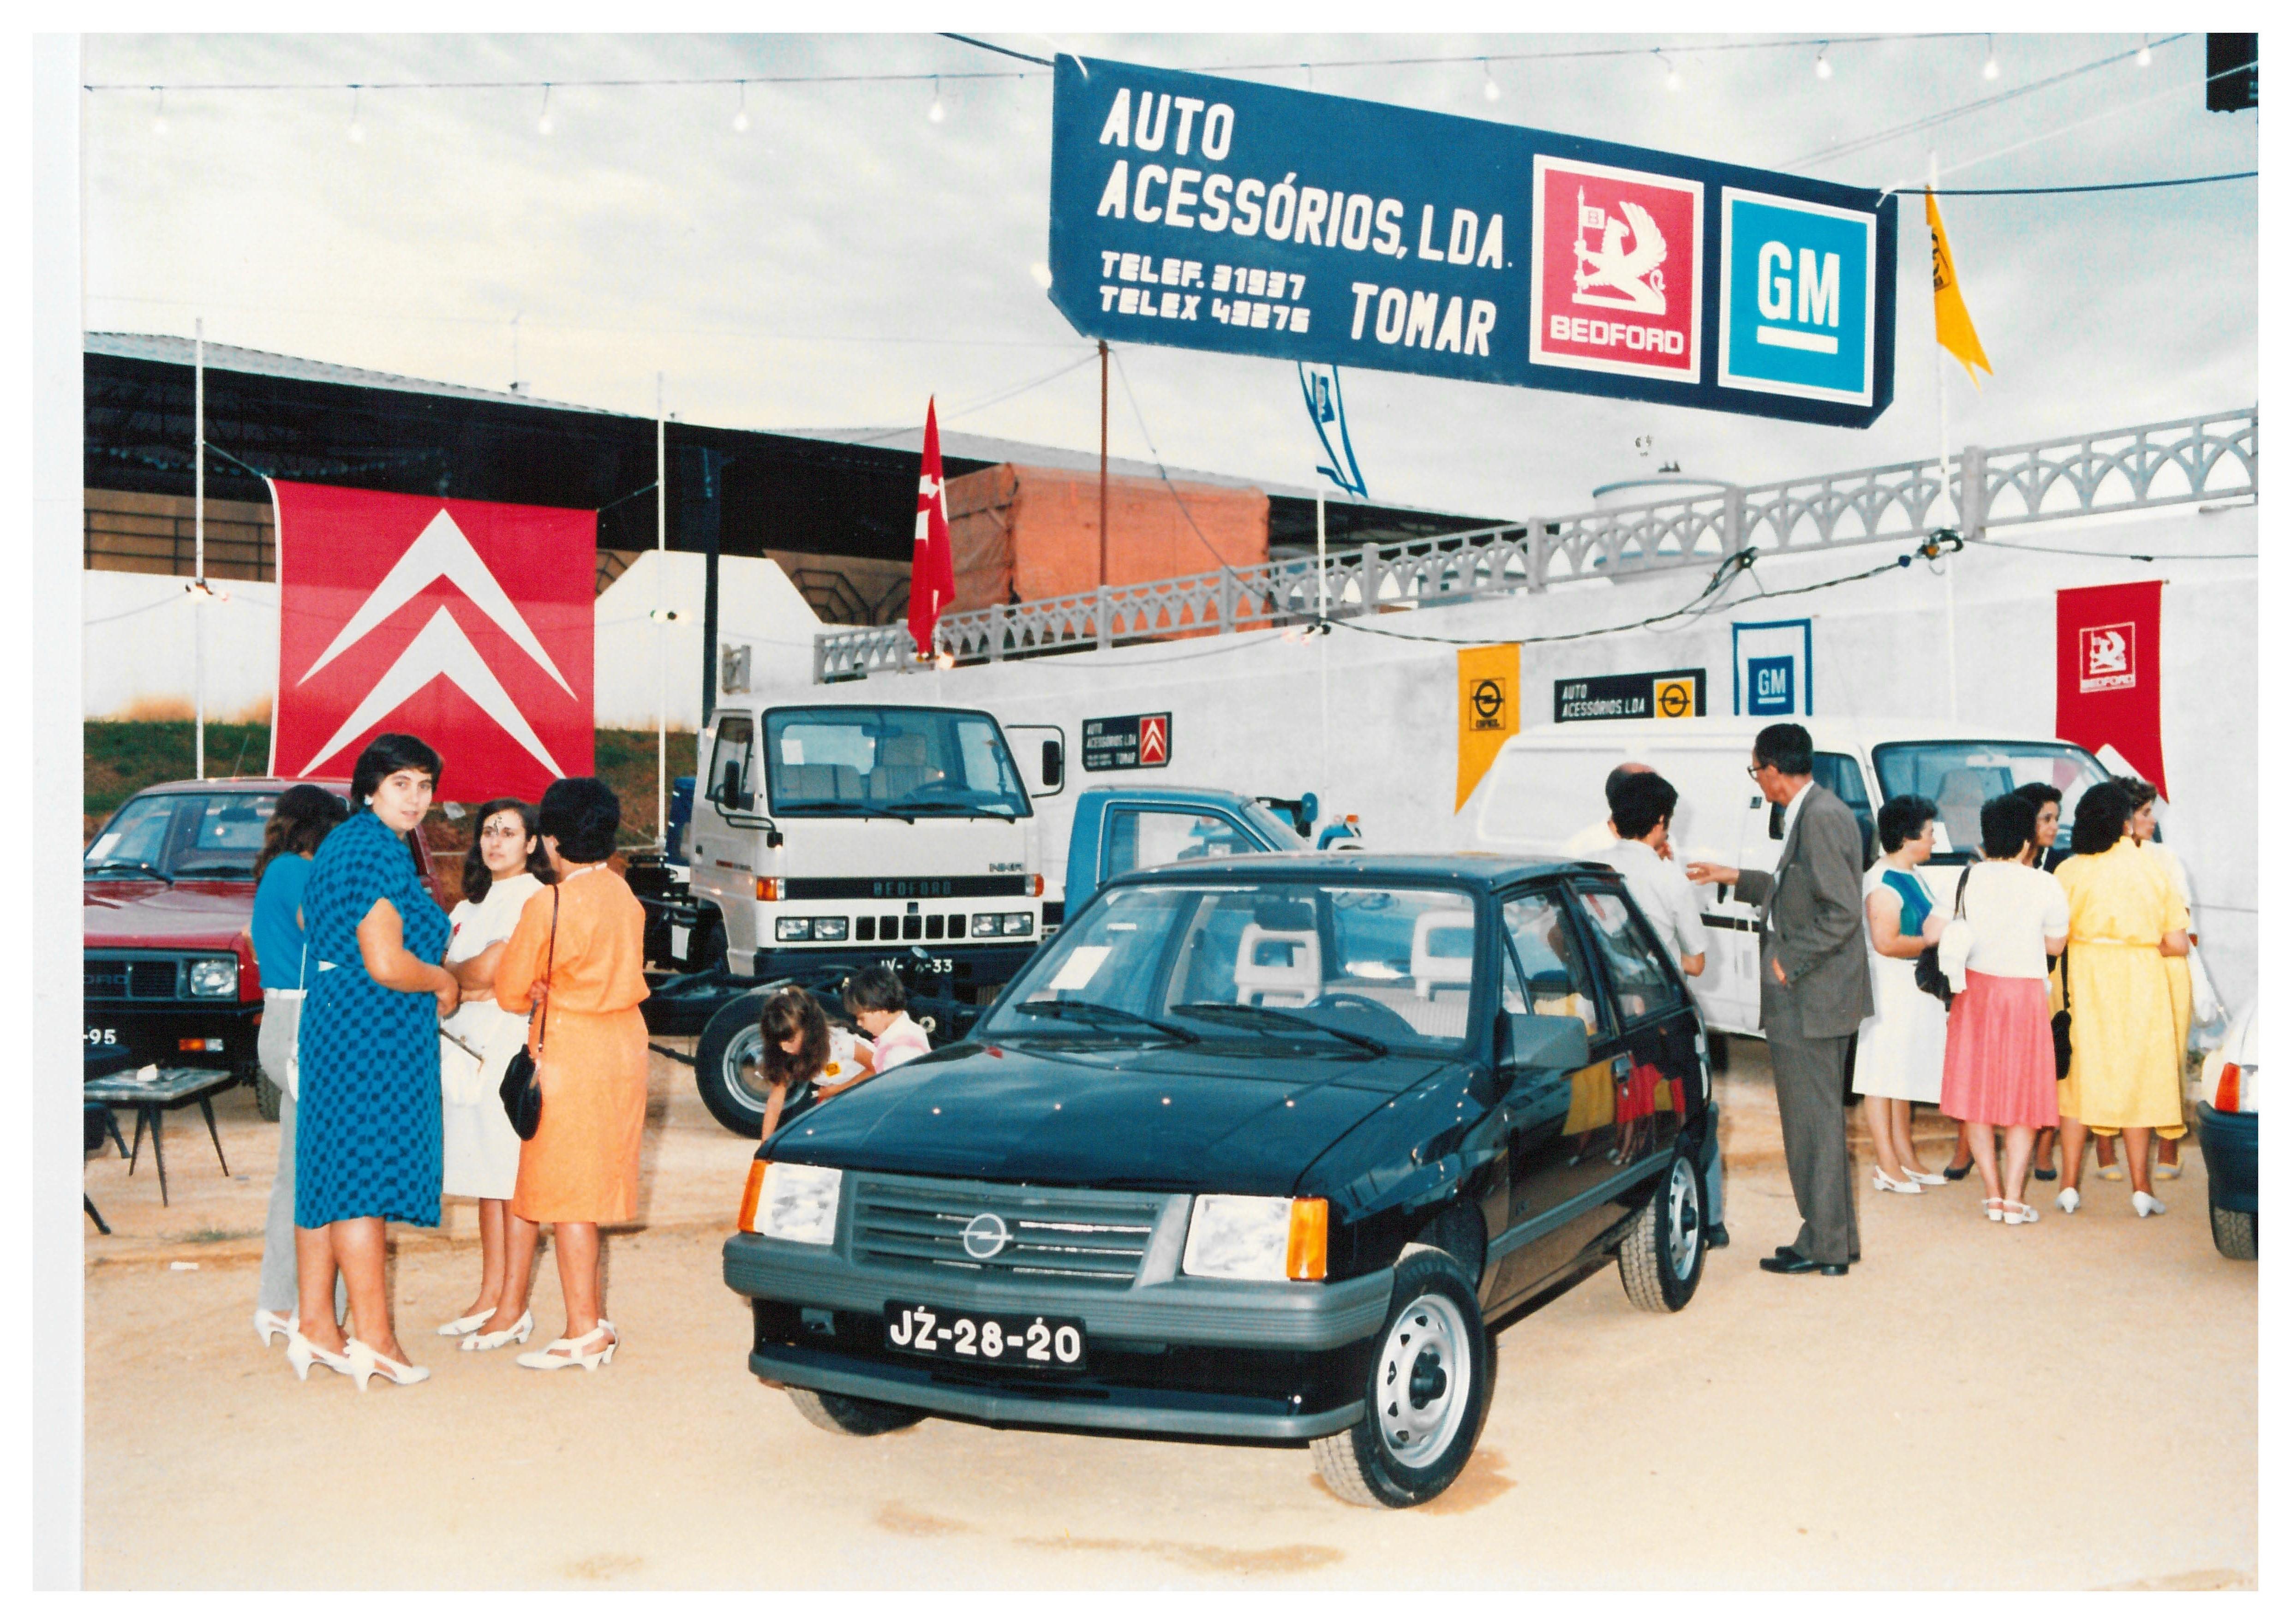 1986 feira de s. miguel (110) photo